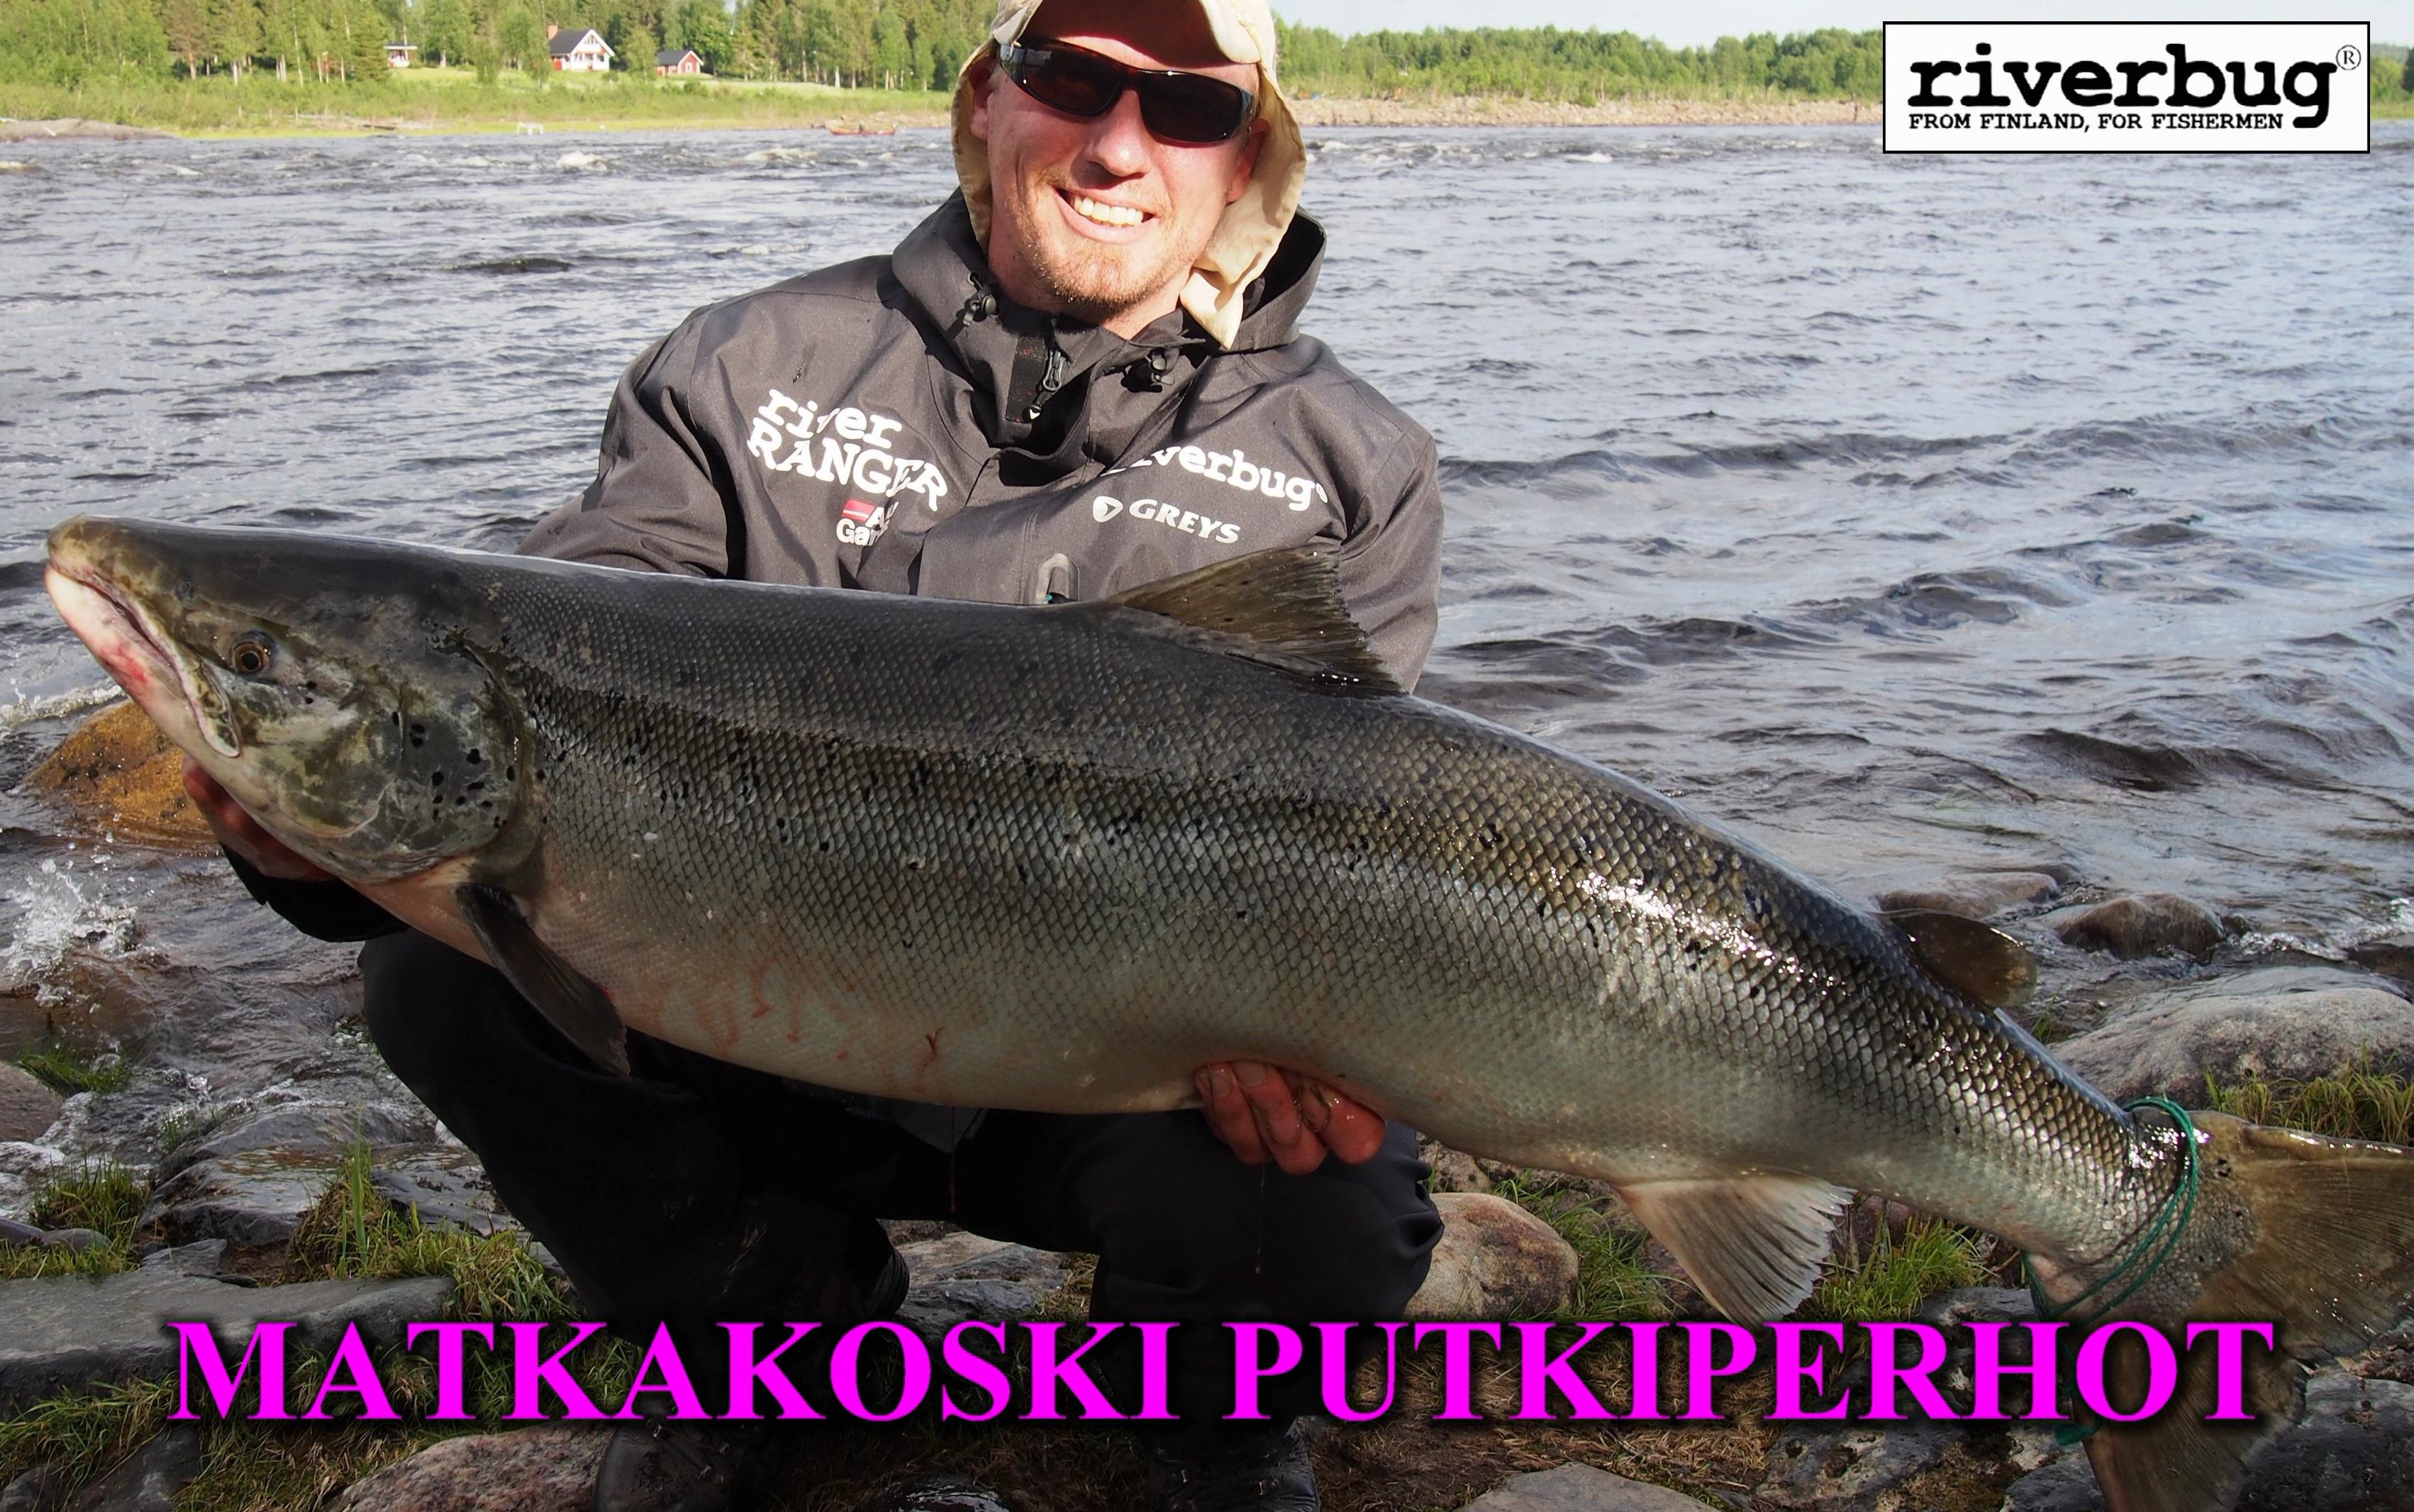 PUTKIPERHOT for Matkakoski salmon by RiverBug tube flies. #matkakoski #putkiperhot #riverbug #lohi #lohiperho #tornionjoki #salmon #flytying #tubfluga